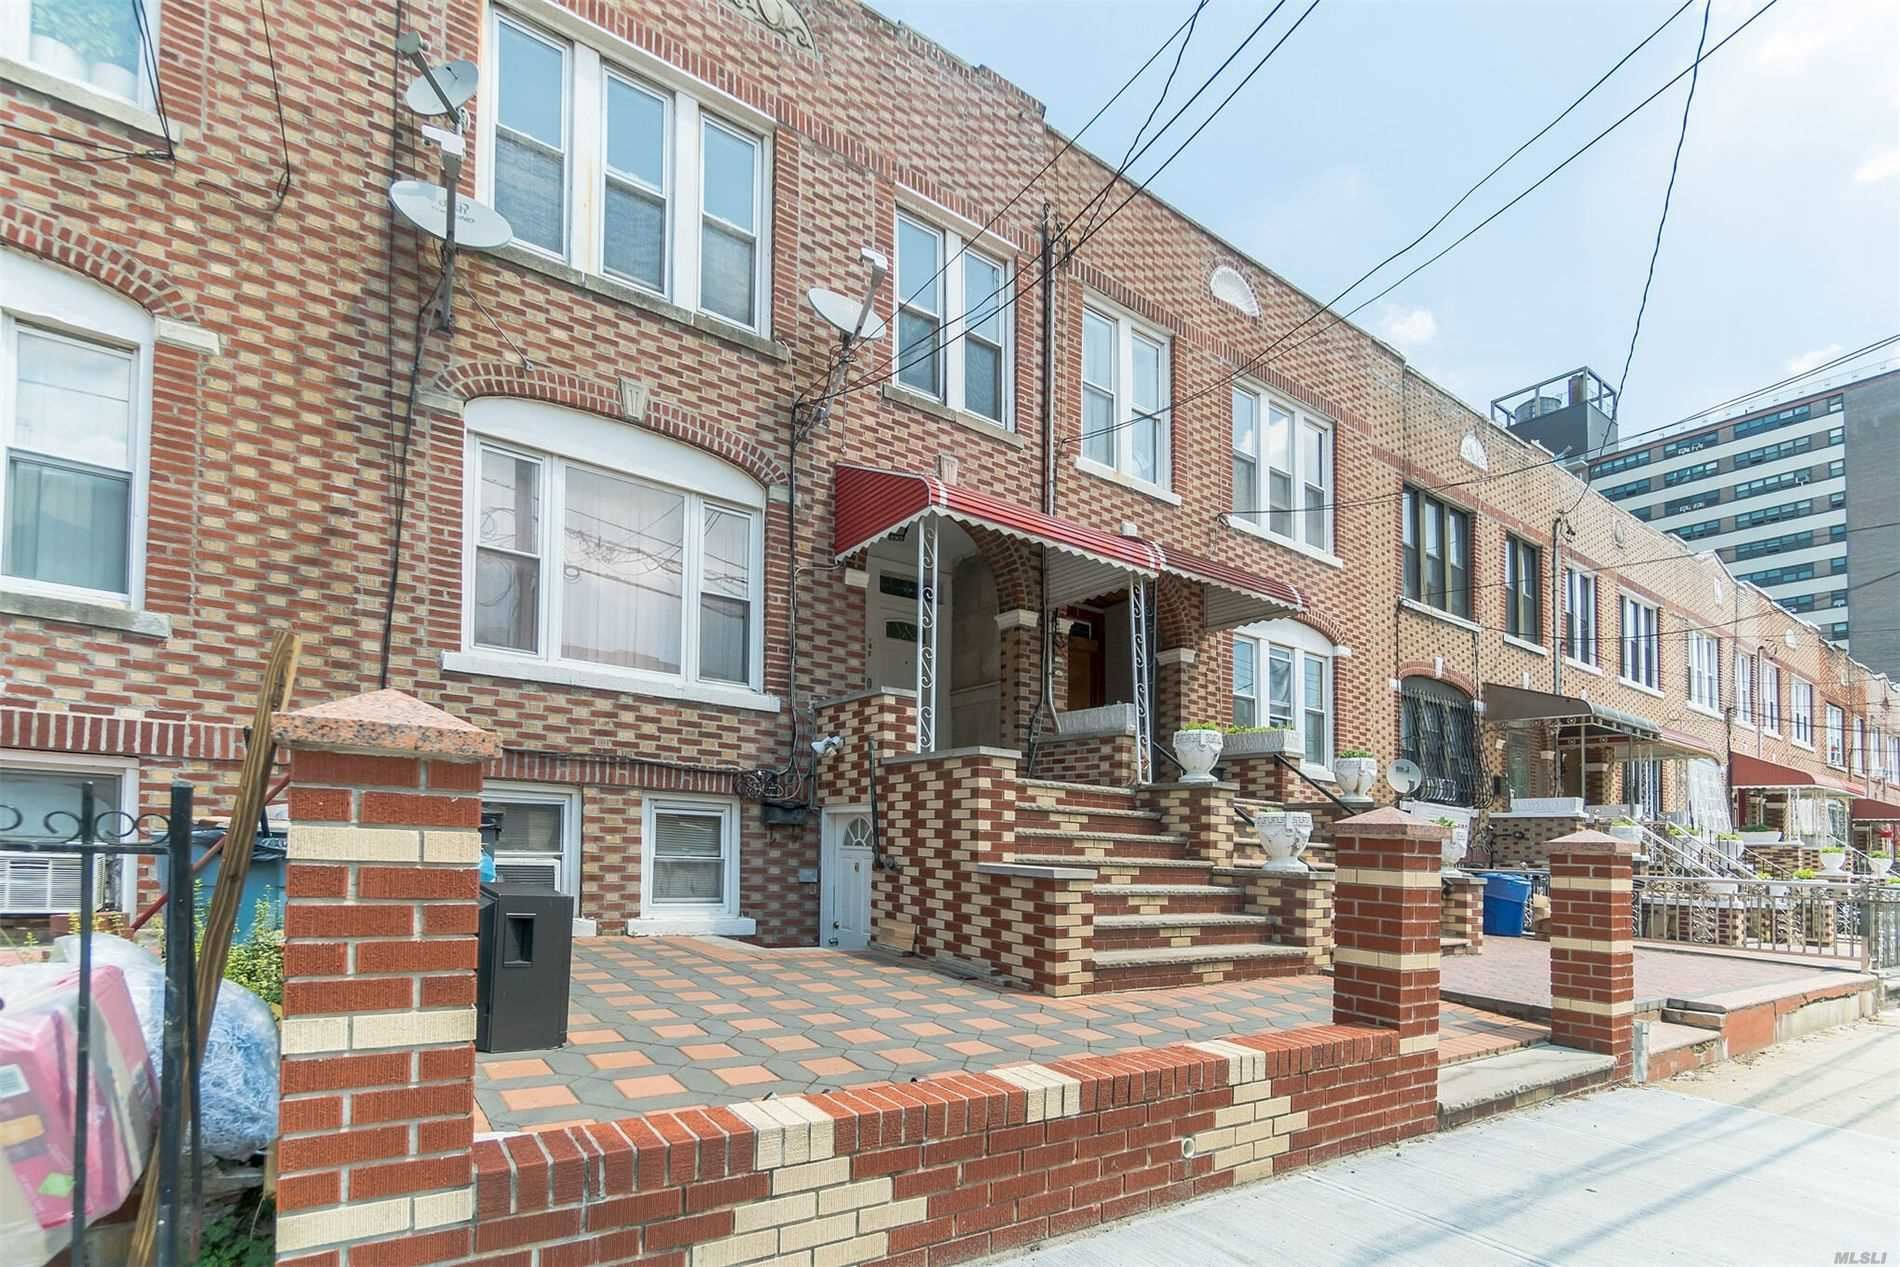 407 Hawthorne St, Brooklyn, NY 11203 - MLS#: 3232674